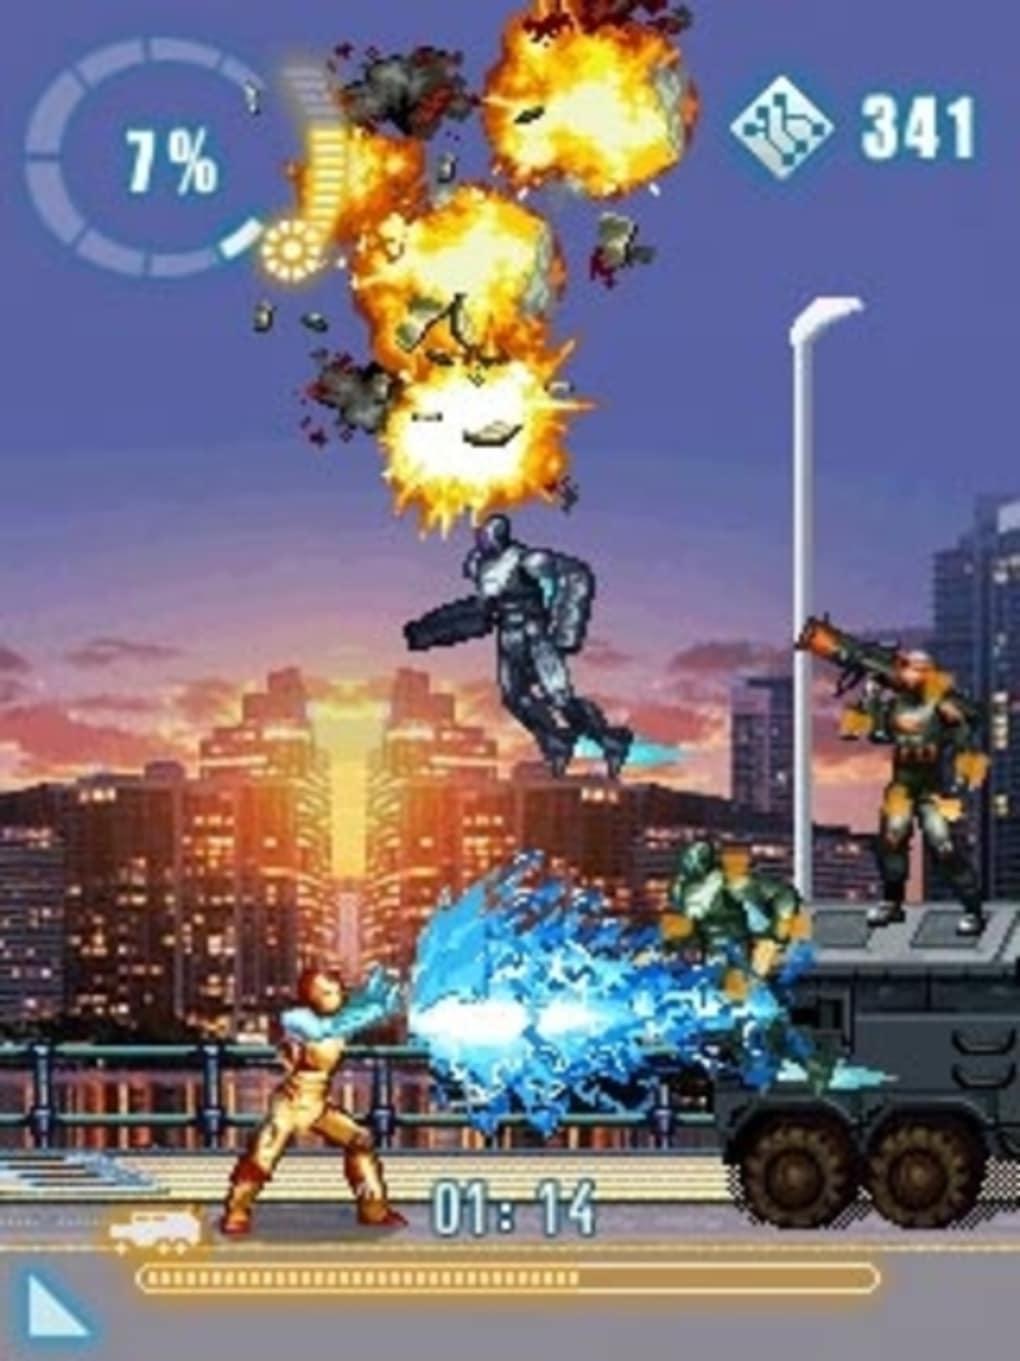 Lego iron man 3 games download